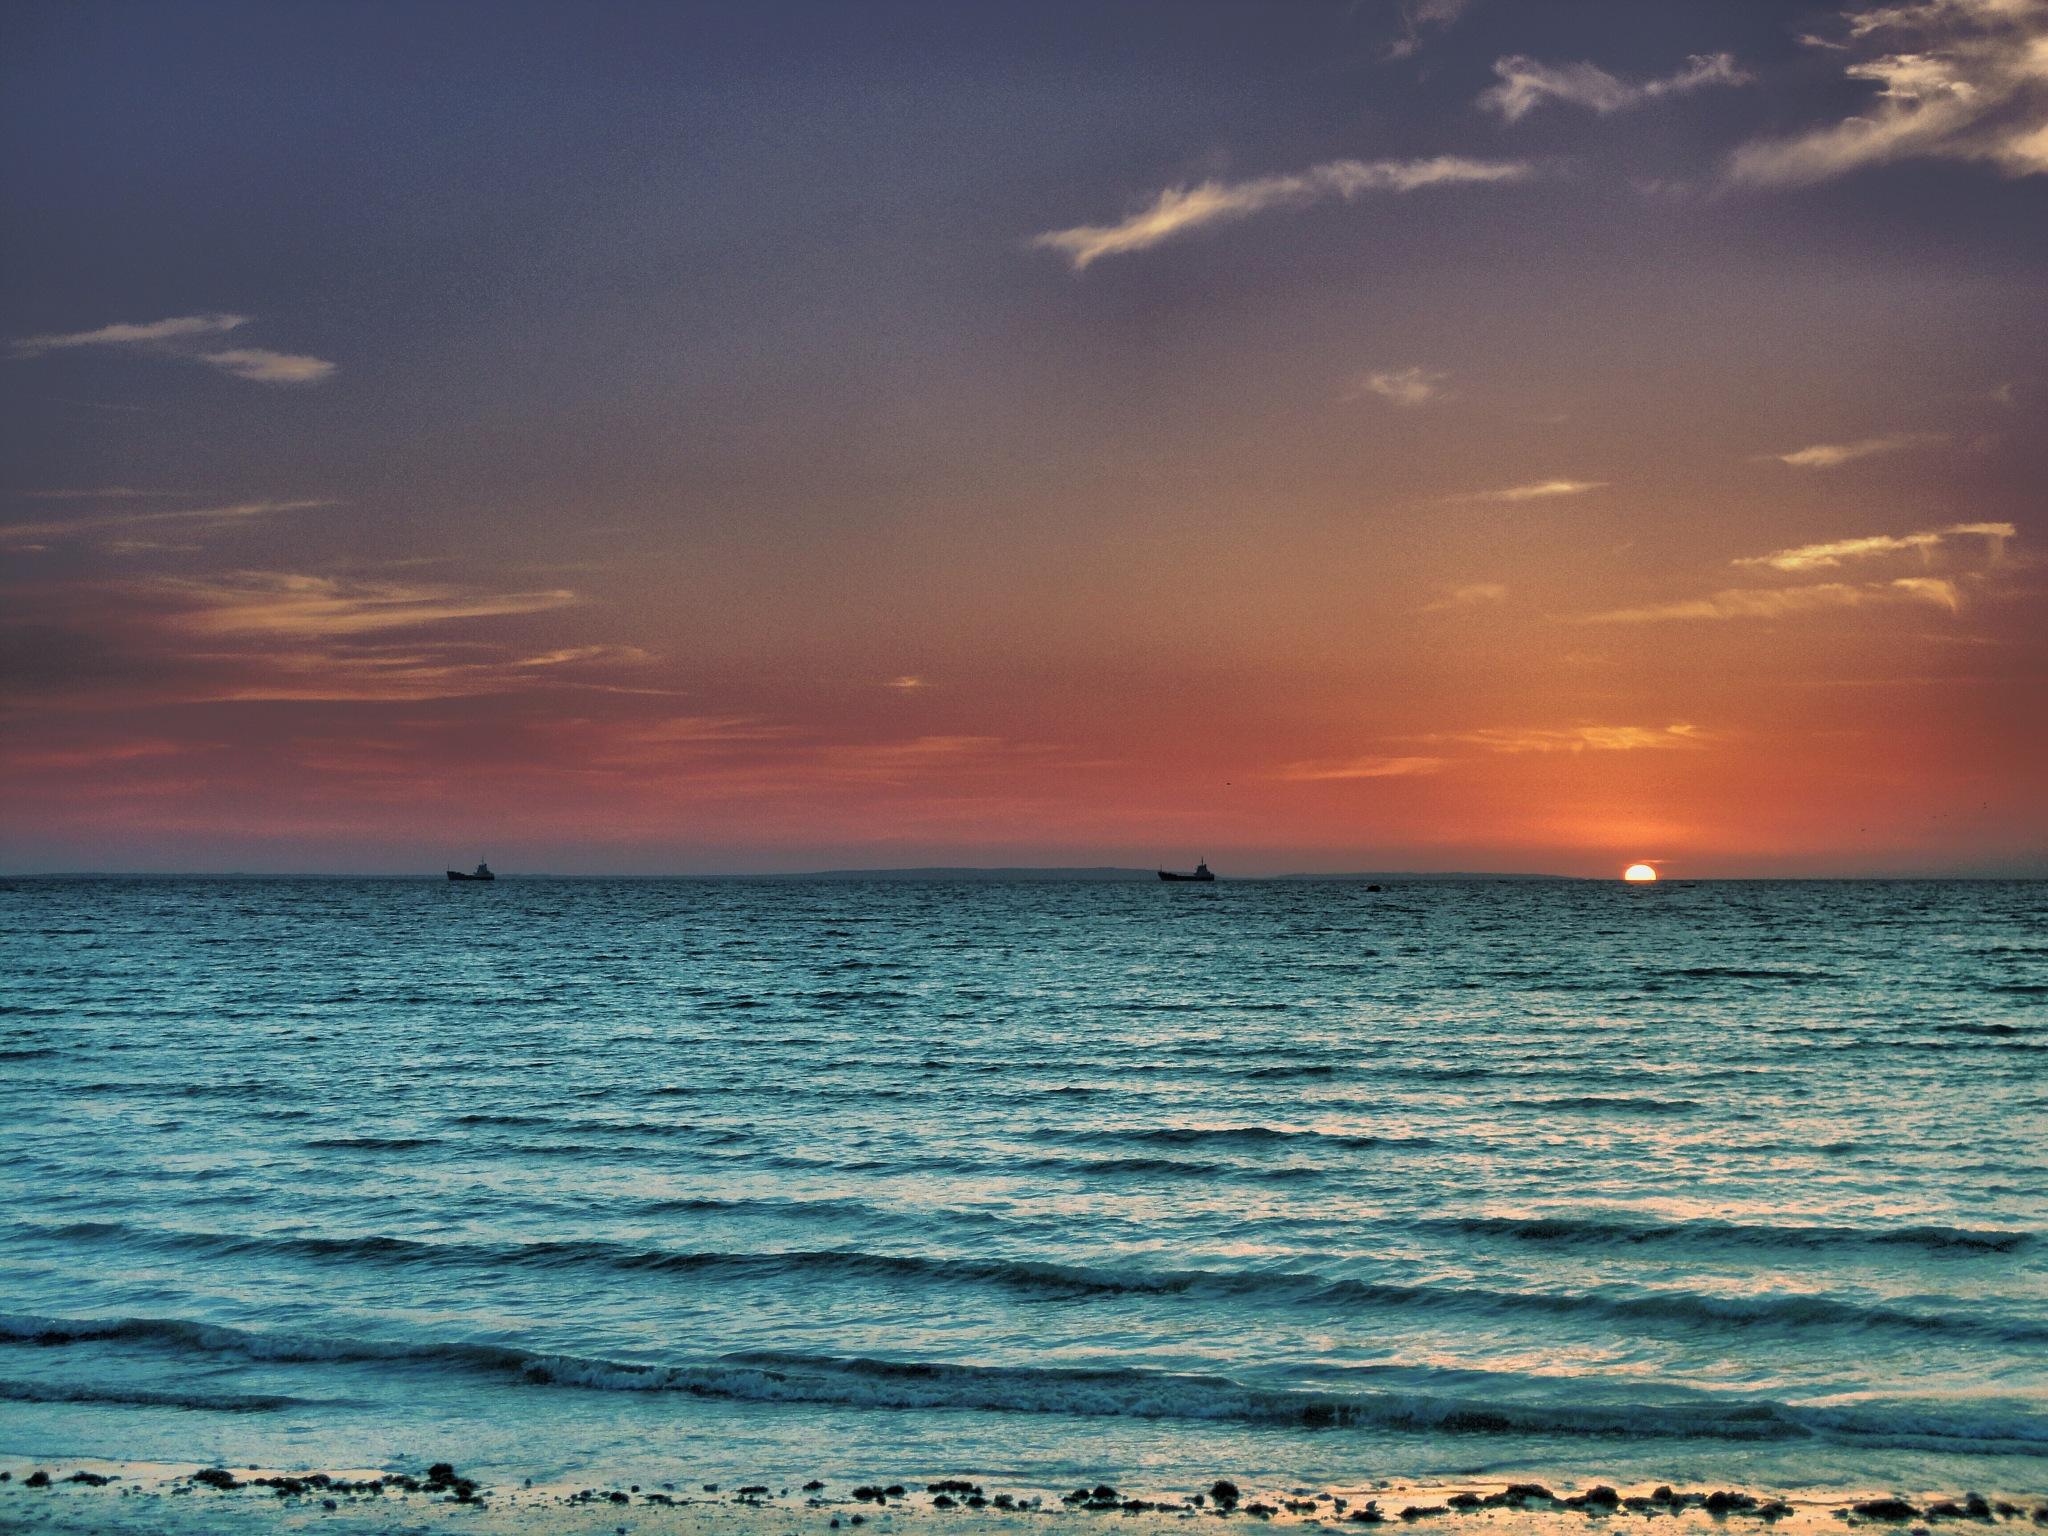 Sunset in Tiss by Rassoul Jamshidzehi